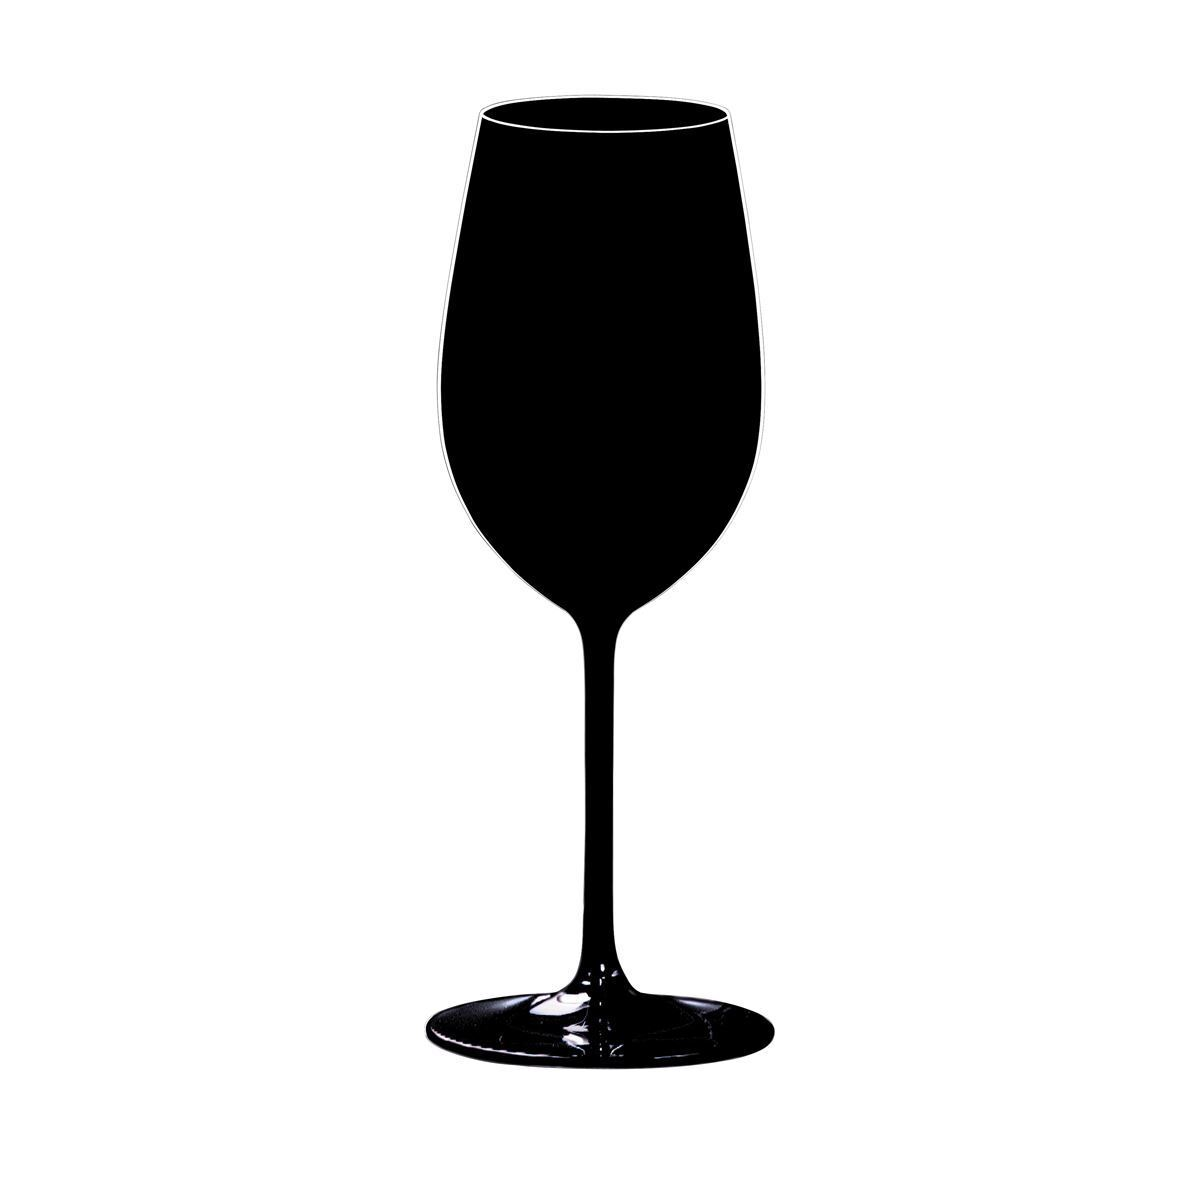 Riedel Sommeliers aveugle Bland dégustation verre (Single)